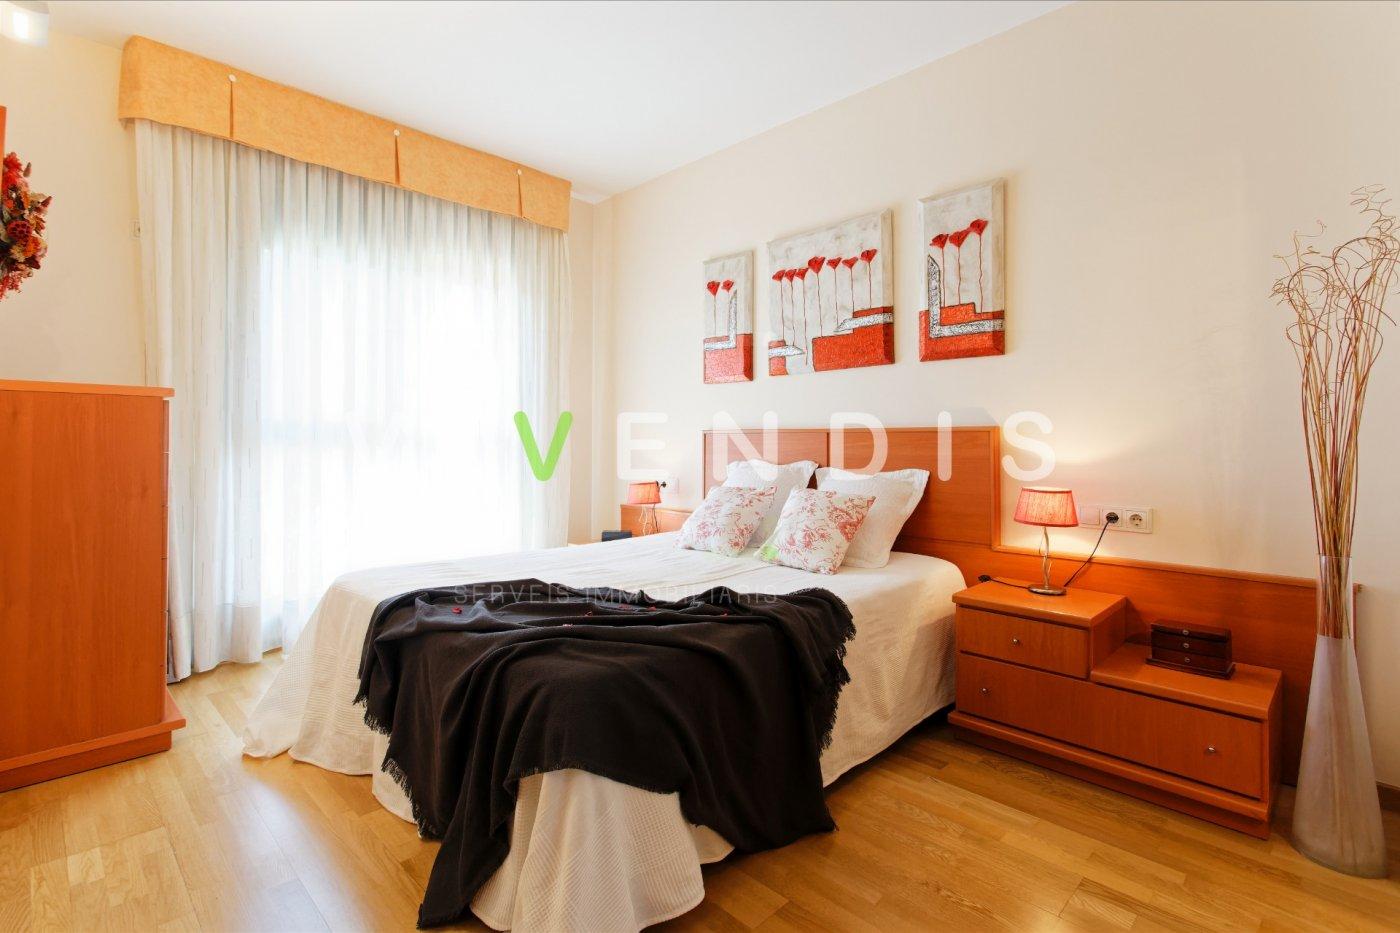 Piso · Palleja · Residencial 229.000€€